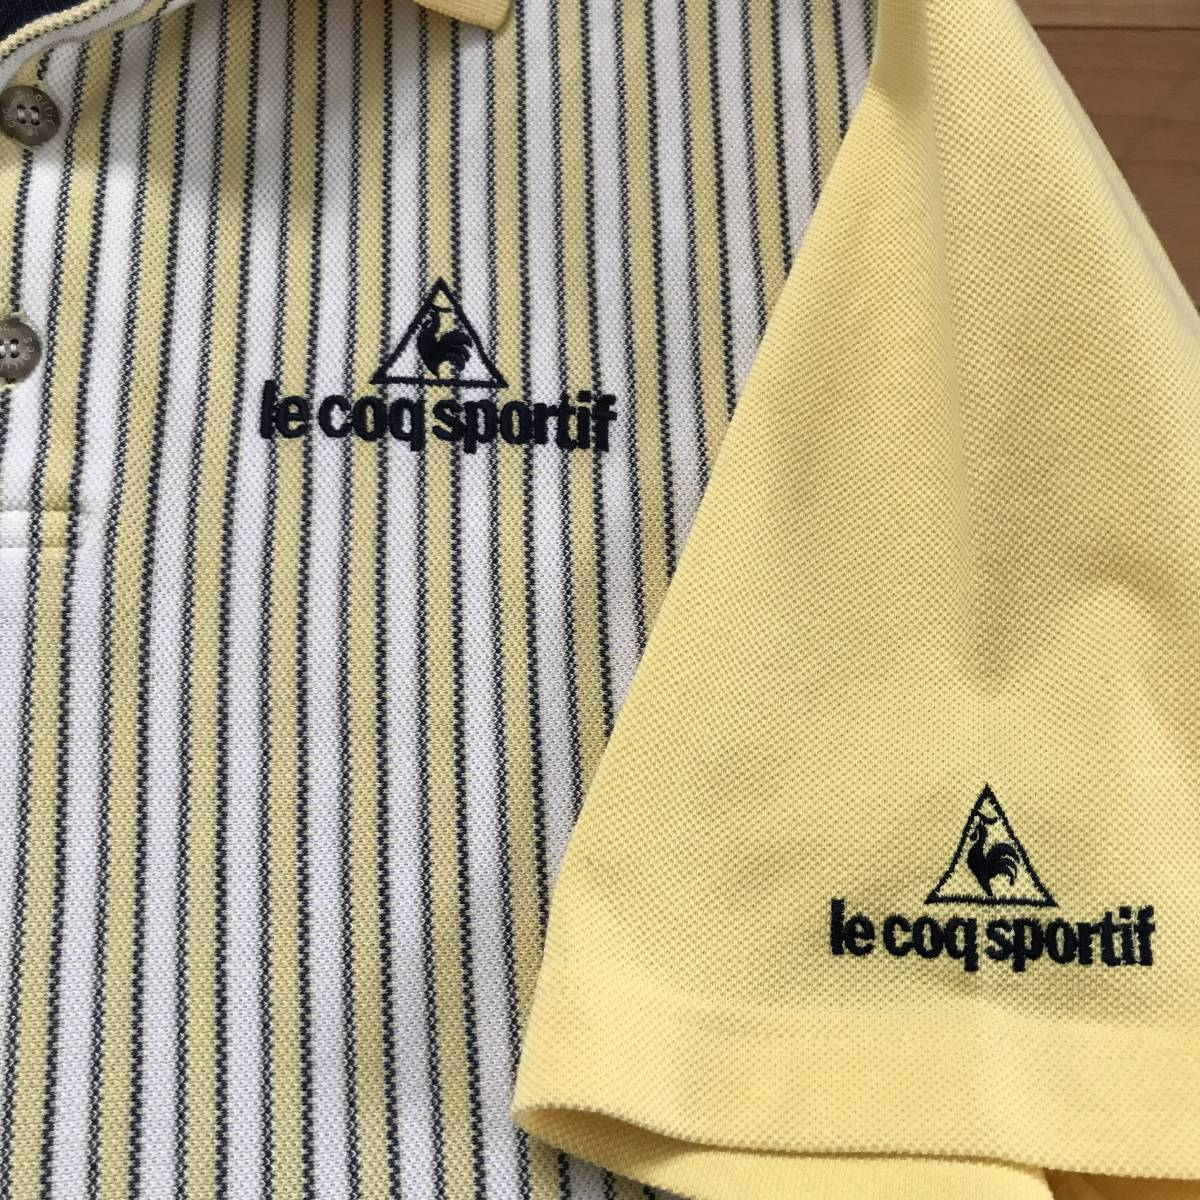 le coq sportif GOLF COLLECTION ルコック ゴルフ メンズ ストライプ柄 ロゴ刺繍入り 半袖 速乾ストレッチポロシャツ 美品 size S/L_画像7